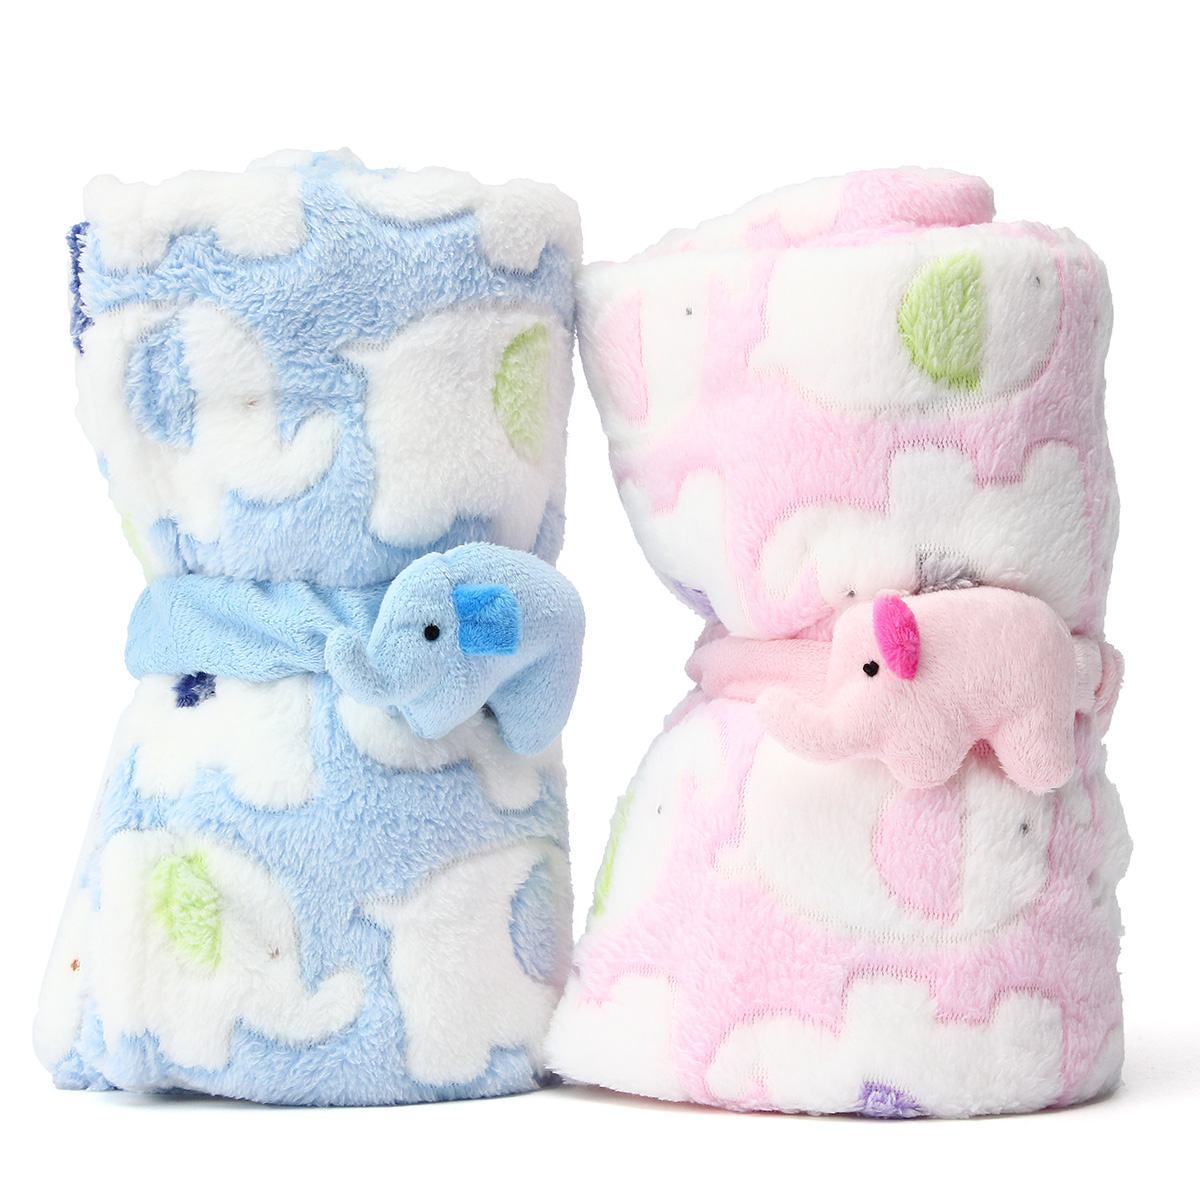 Coral Soft Blanket Kids Children Breathable Blanket Lovely Elephant Baby Soft Trolley Portable Towel  Bath Blanket